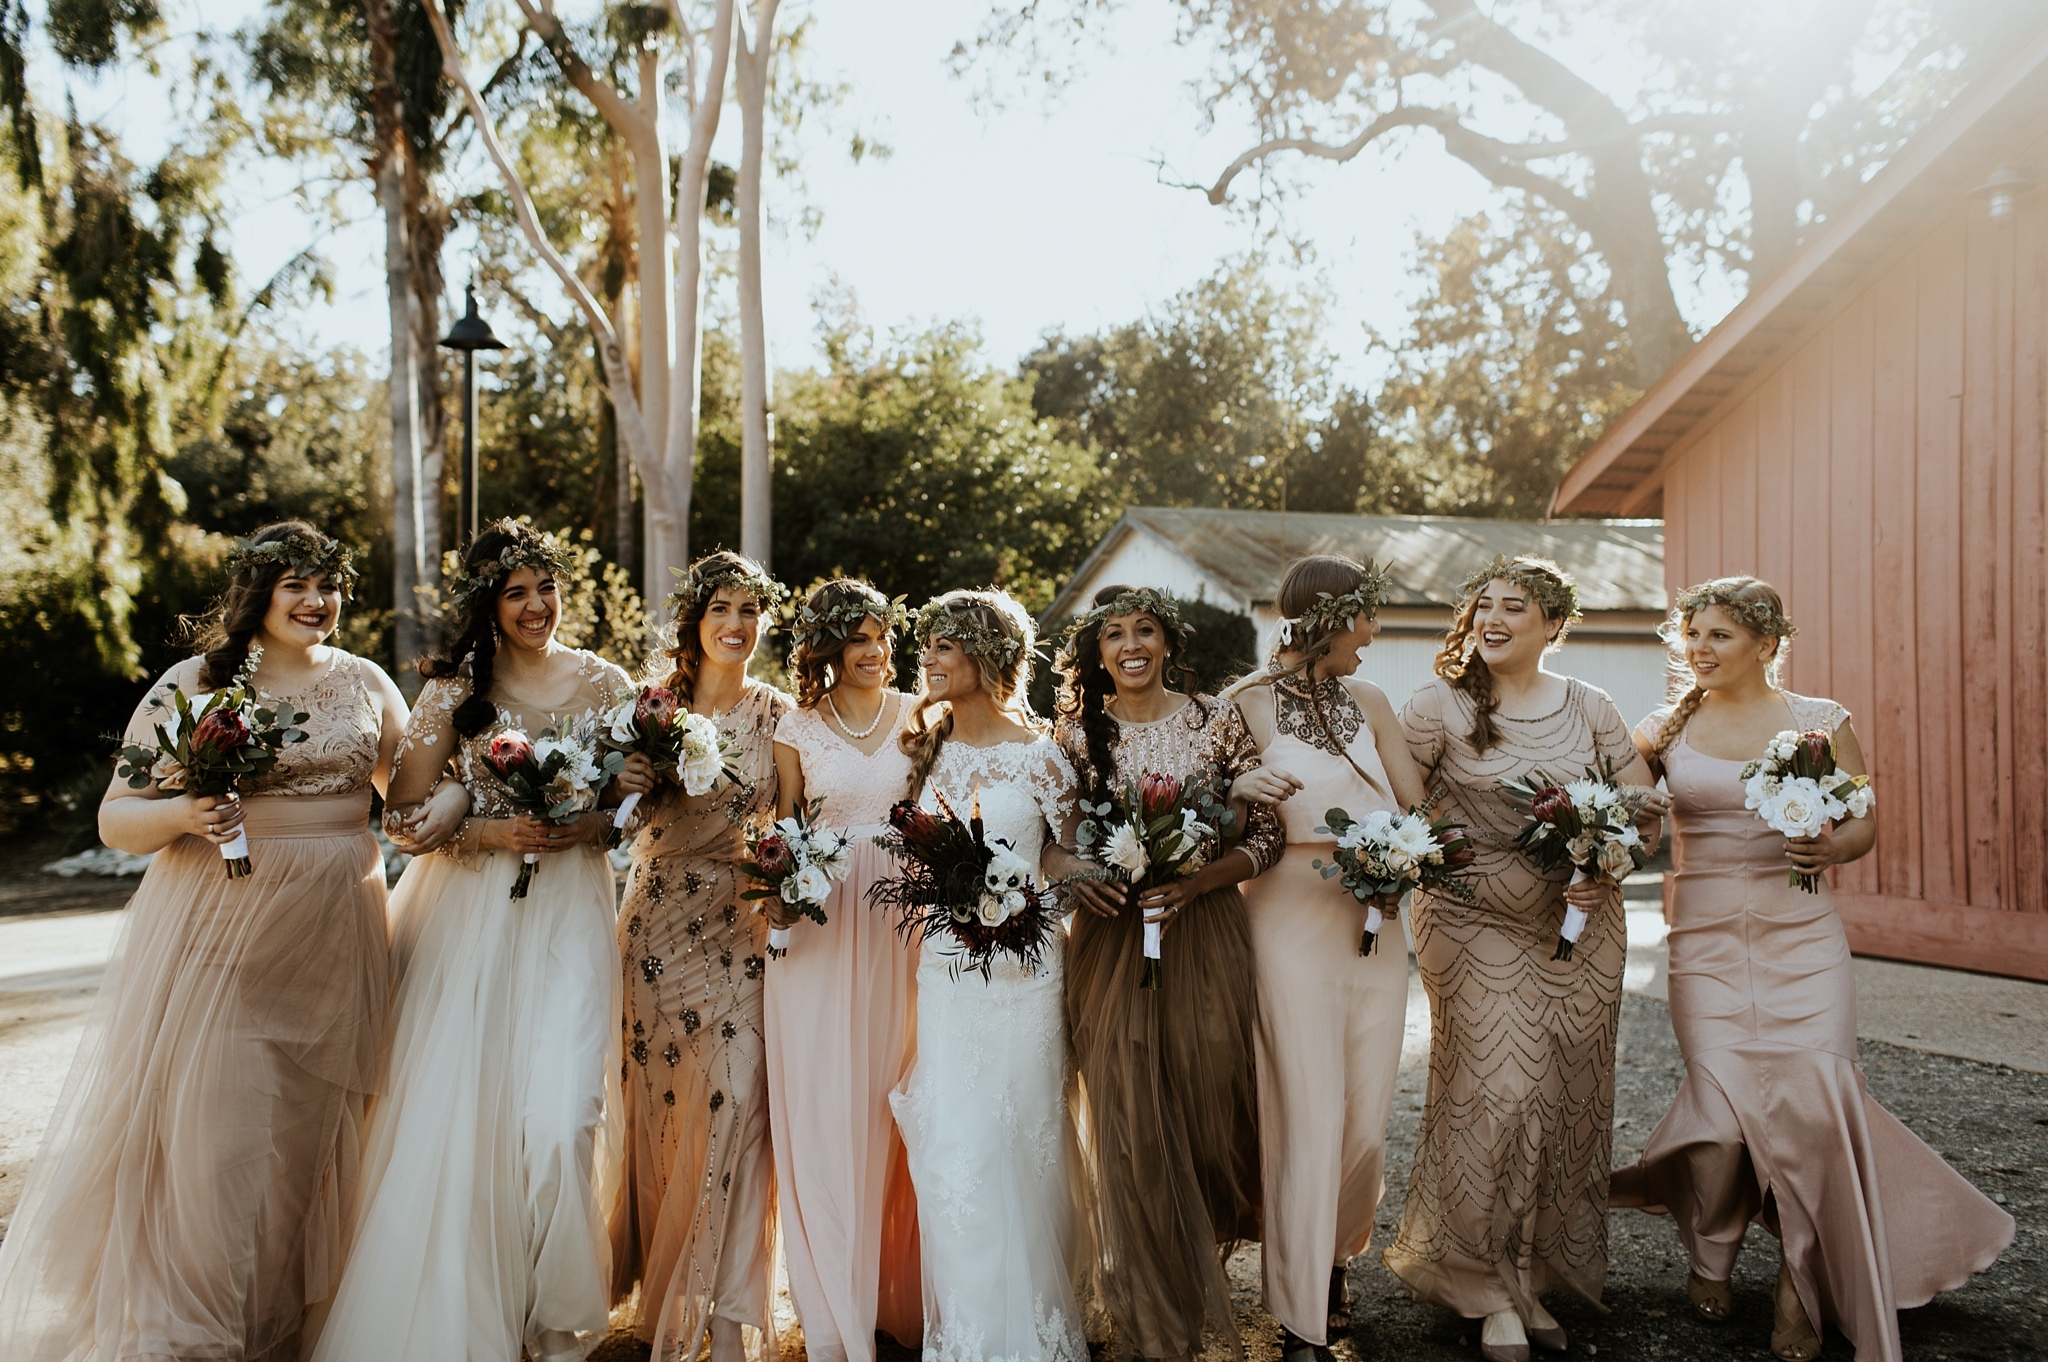 Bohemian Orcutt Ranch Wedding in Los Angeles California  - Los Angeles Californai Wedding Photographer_0019.jpg